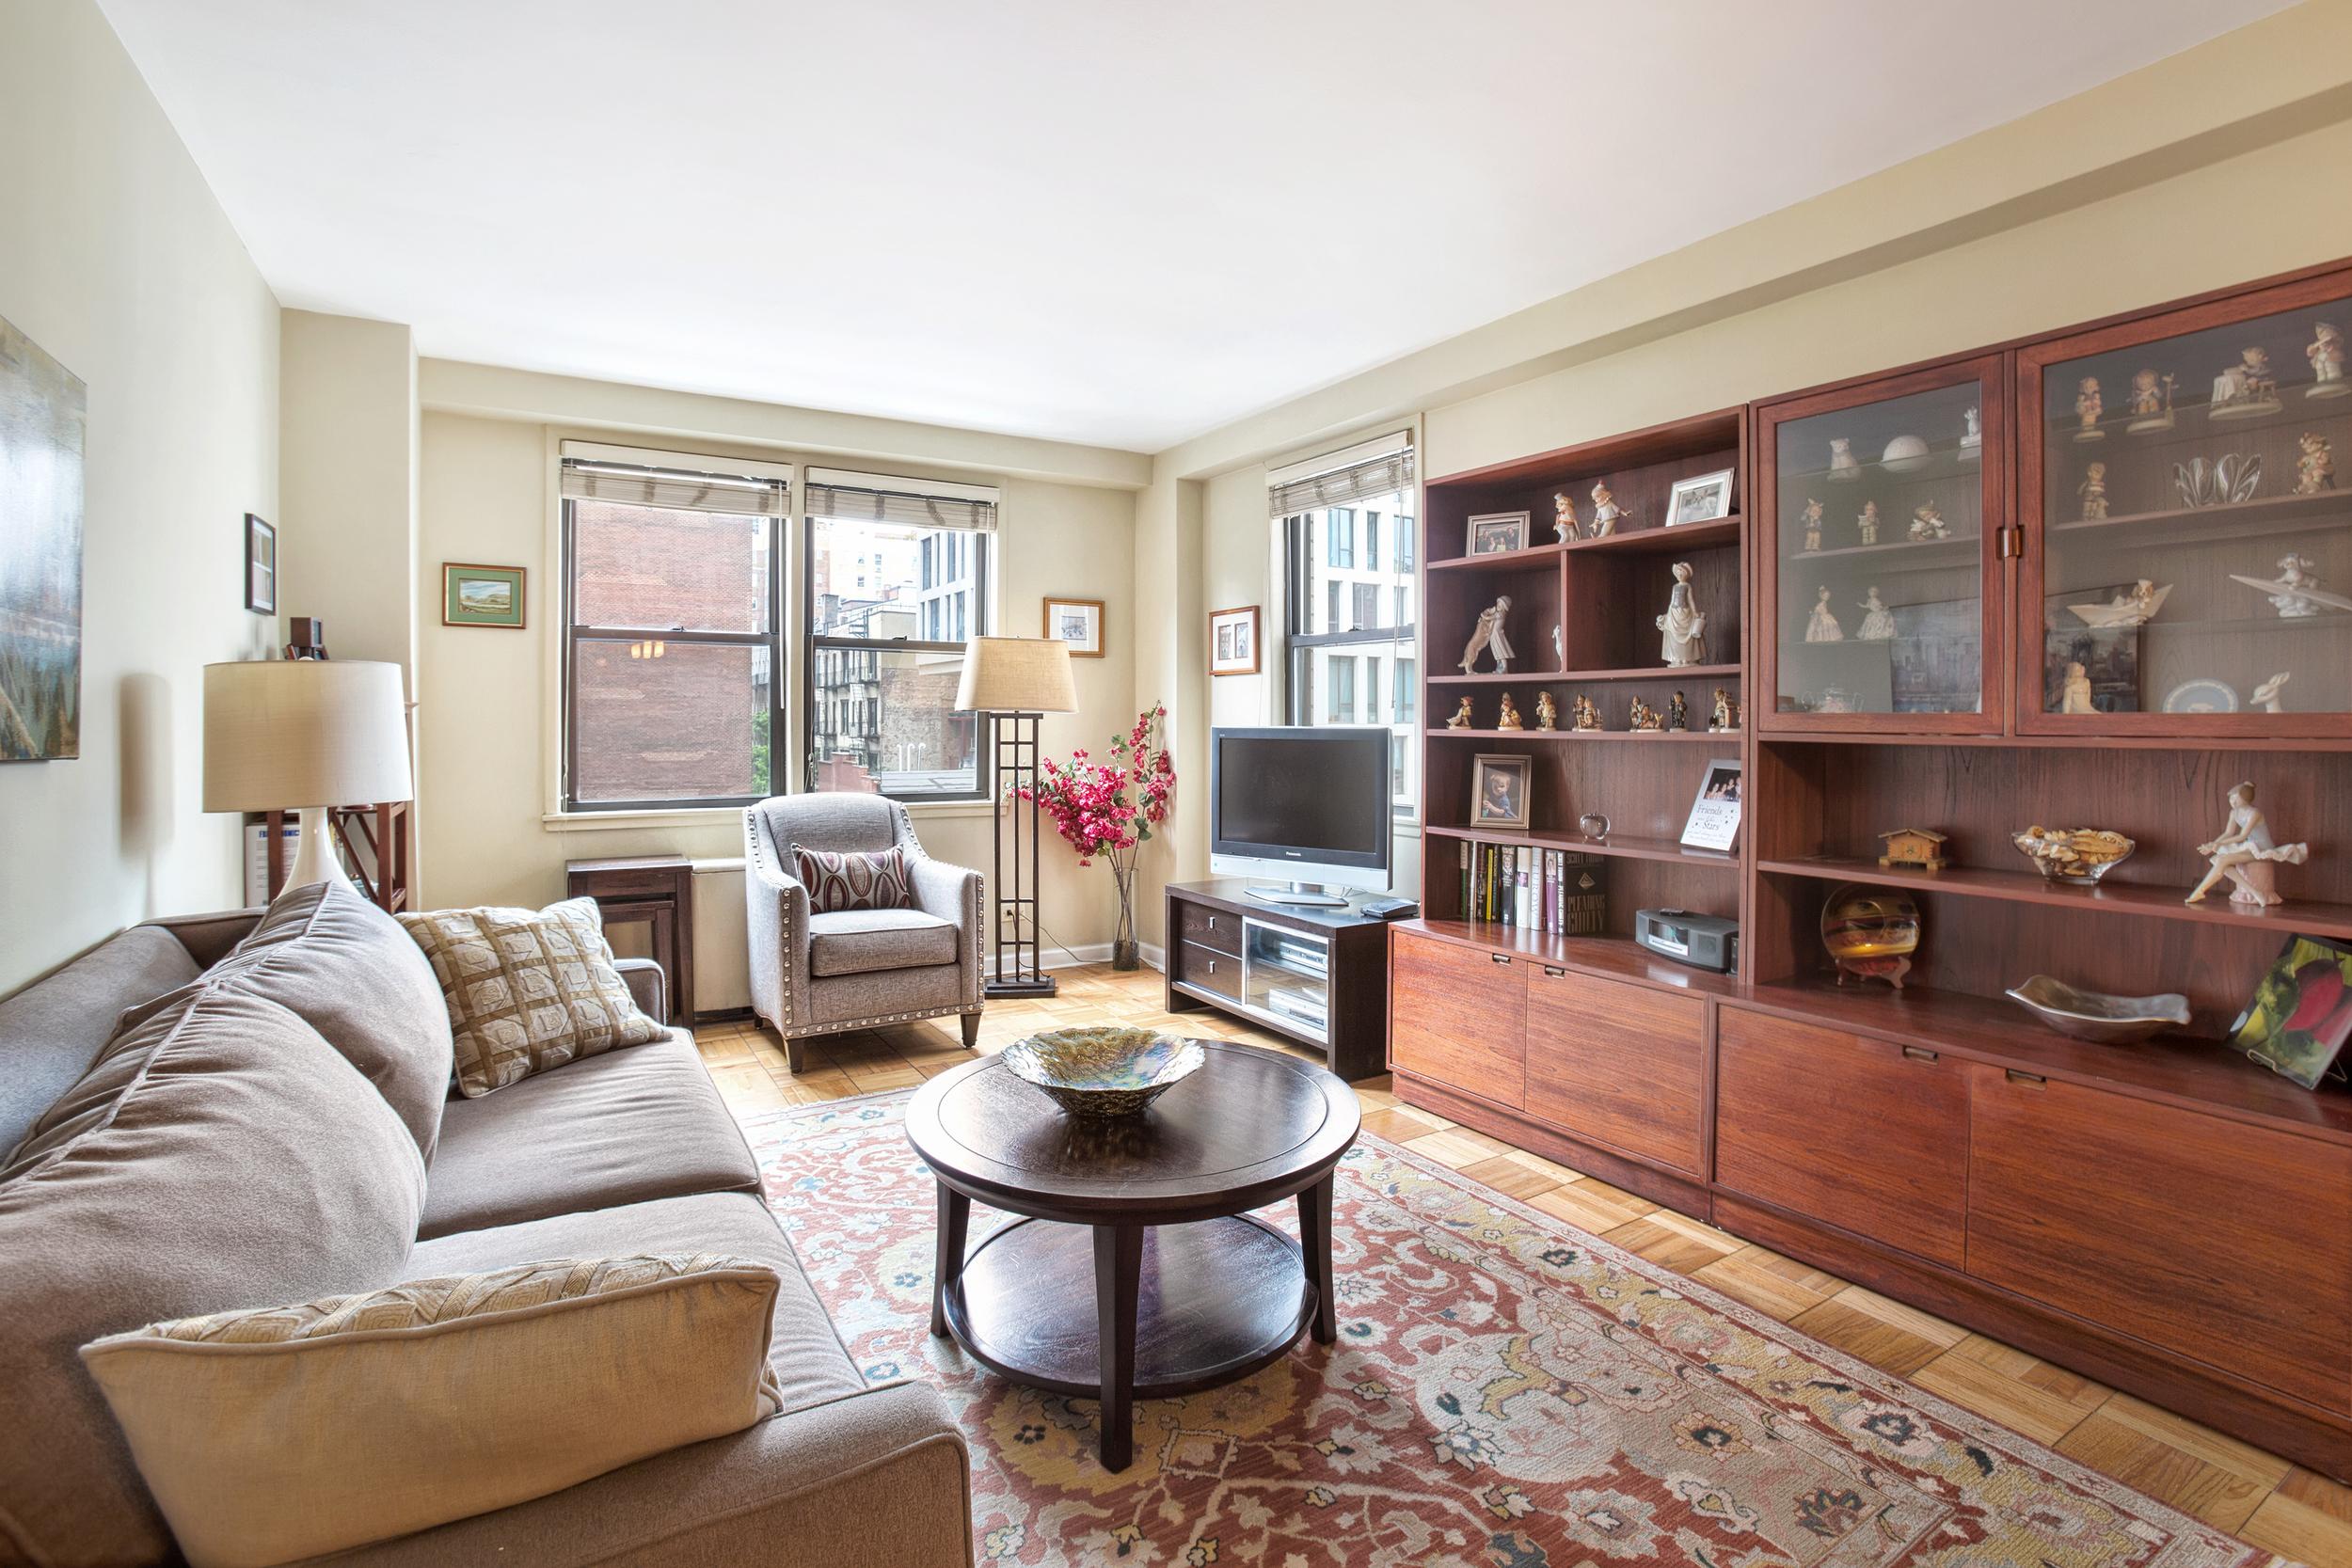 201 East 21st Street #6A - $869,000